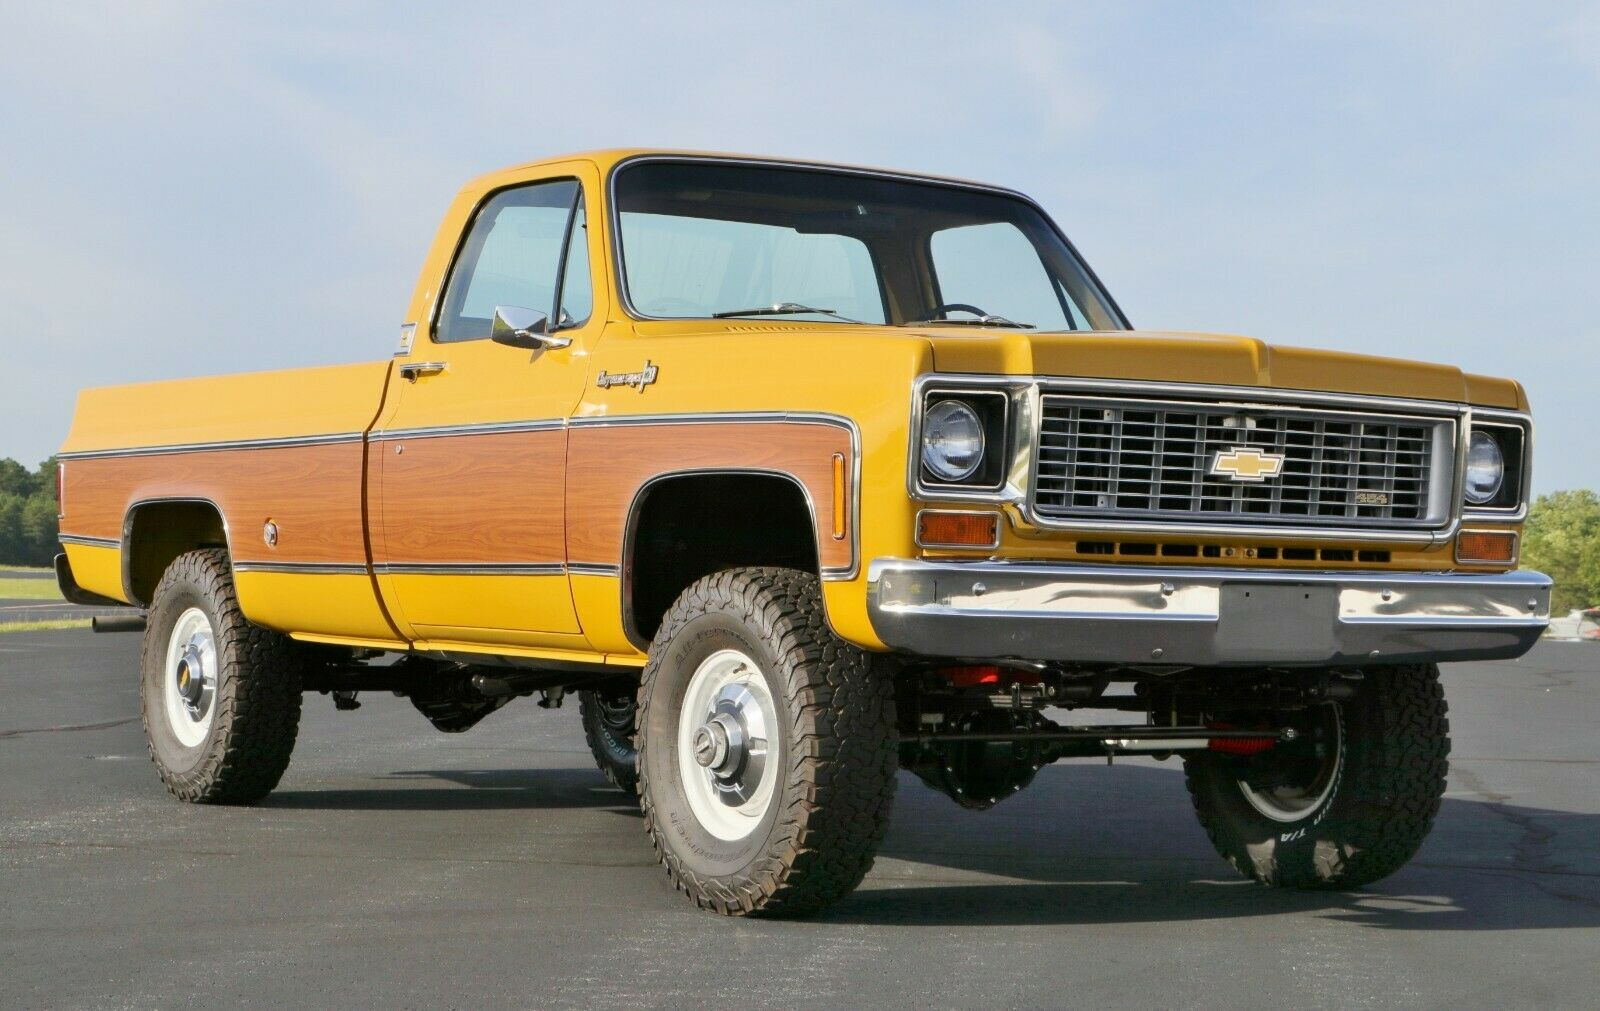 4×4 conversion 1973 Chevrolet C/K Pickup 3500 C20 lifted